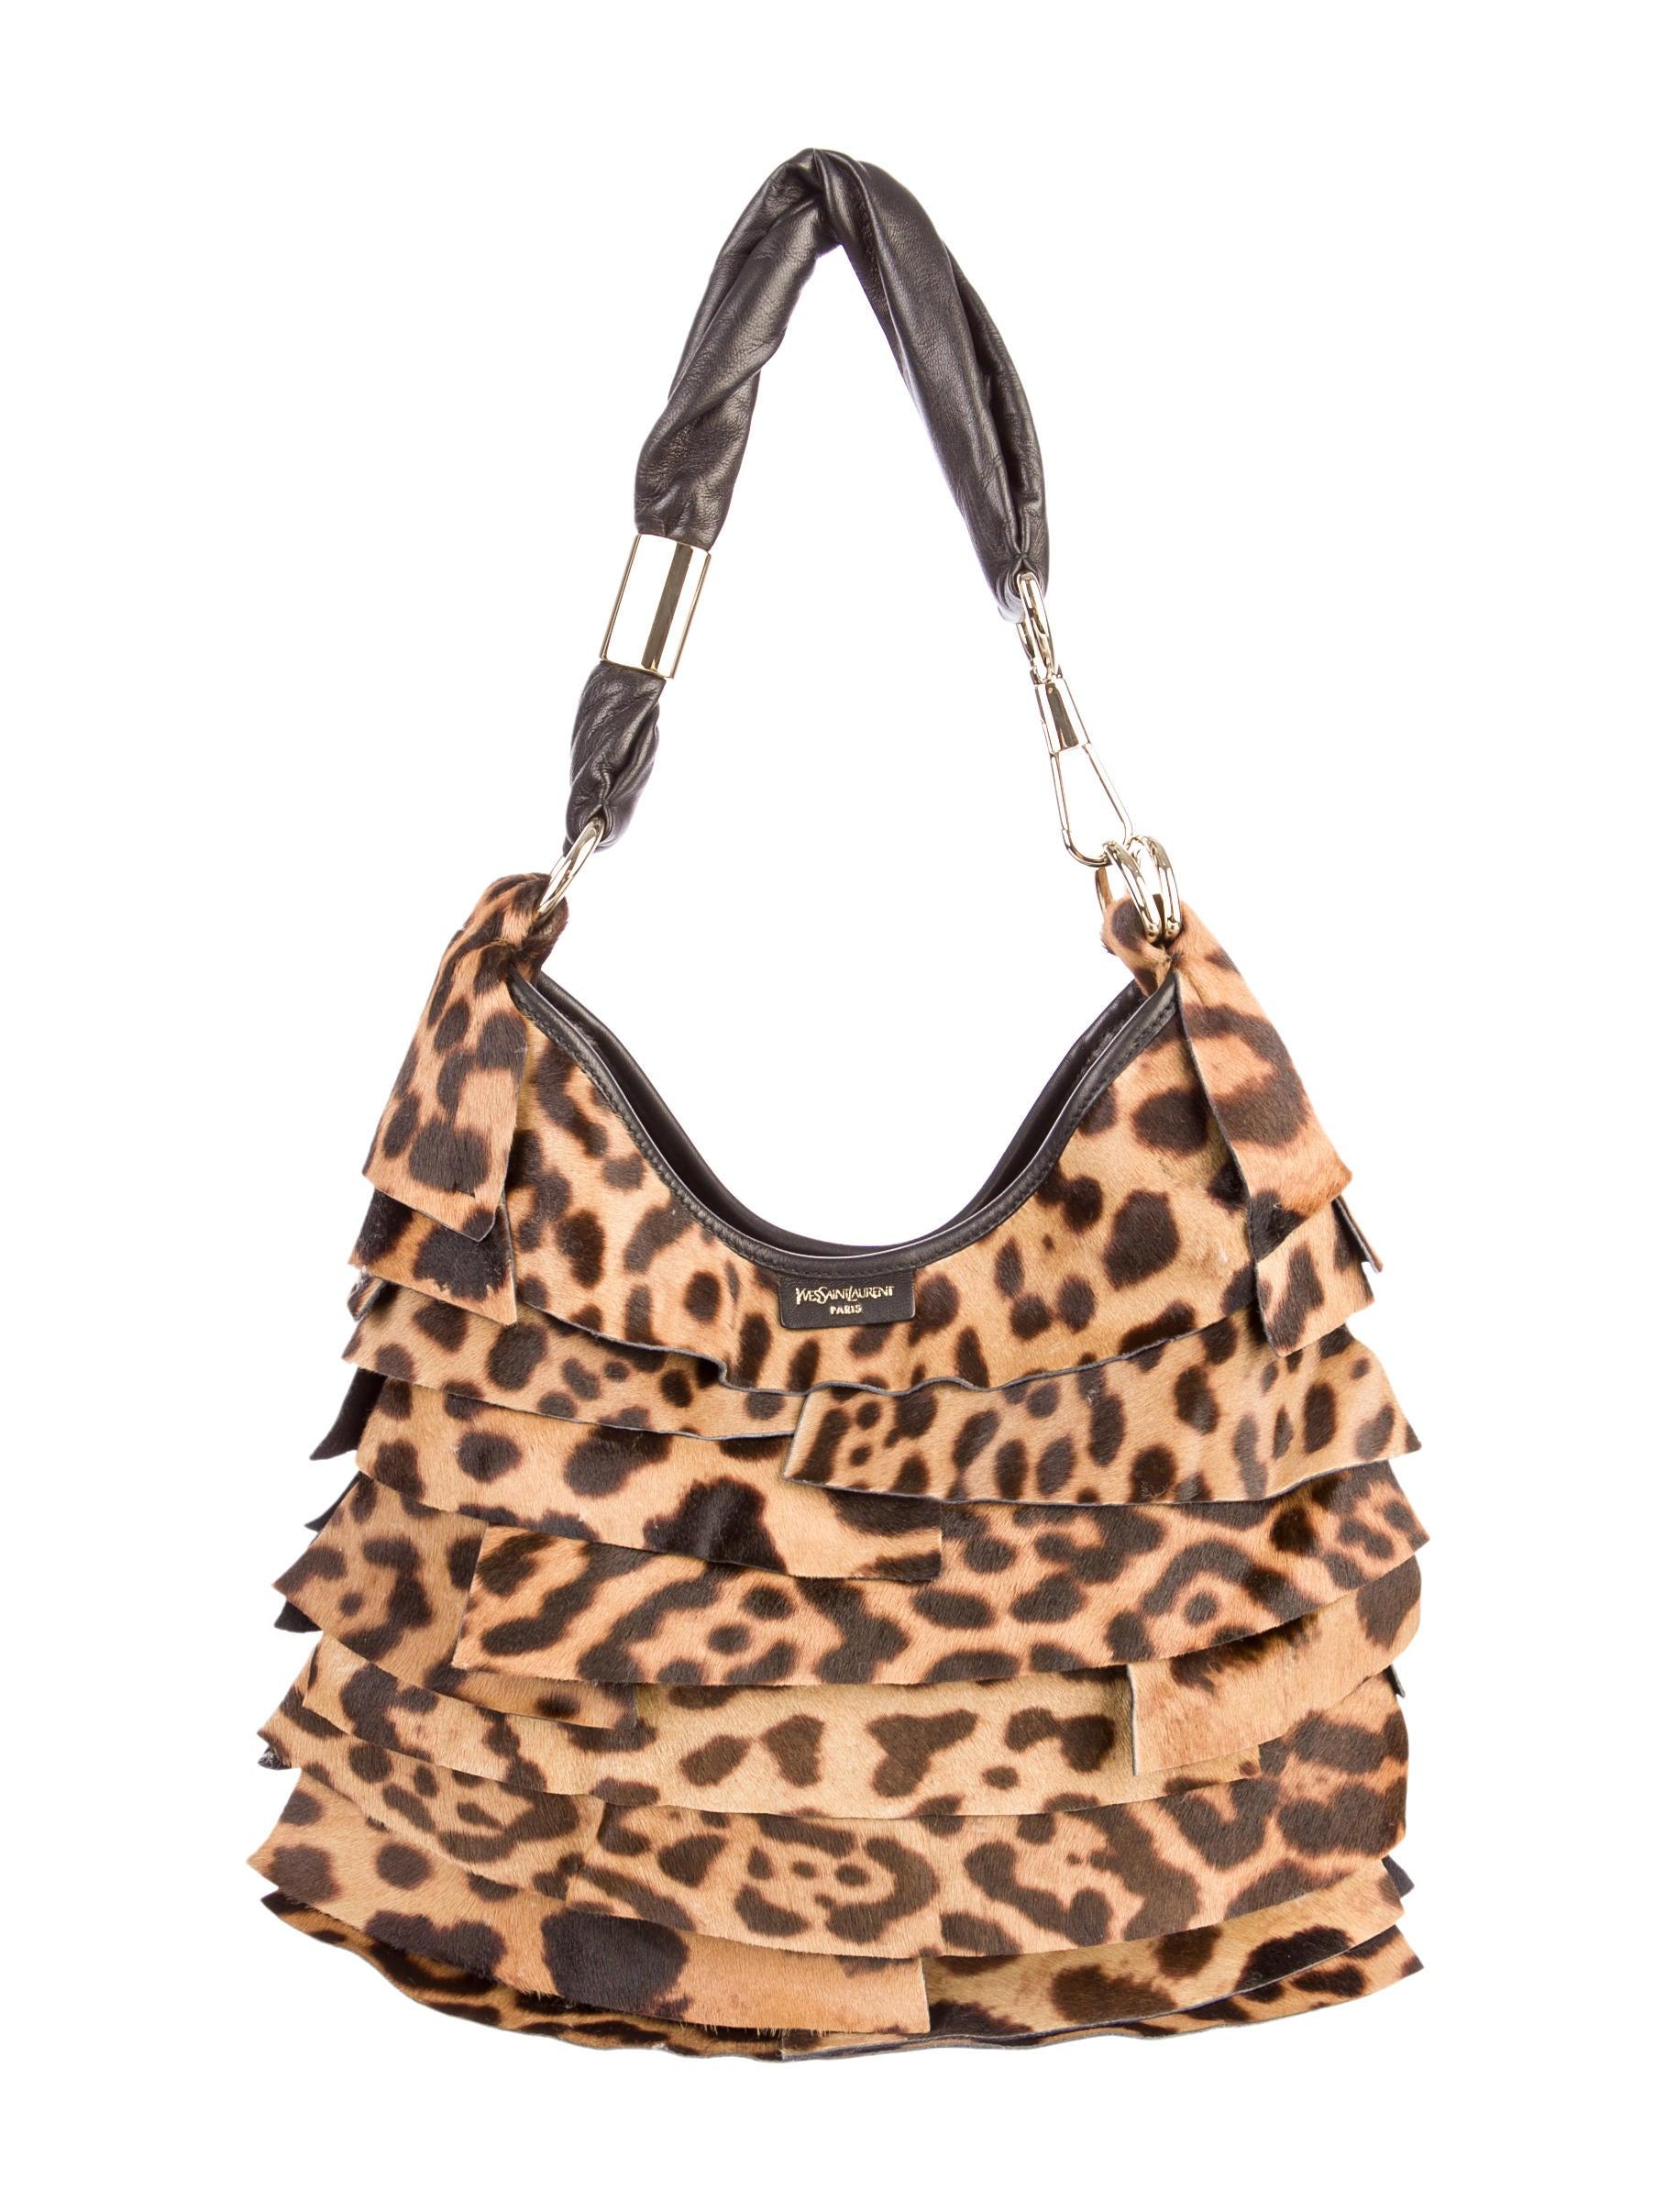 c64380534567 Yves Saint Laurent Ponyhair St. Tropez Bag - Handbags - YVE26660 ...